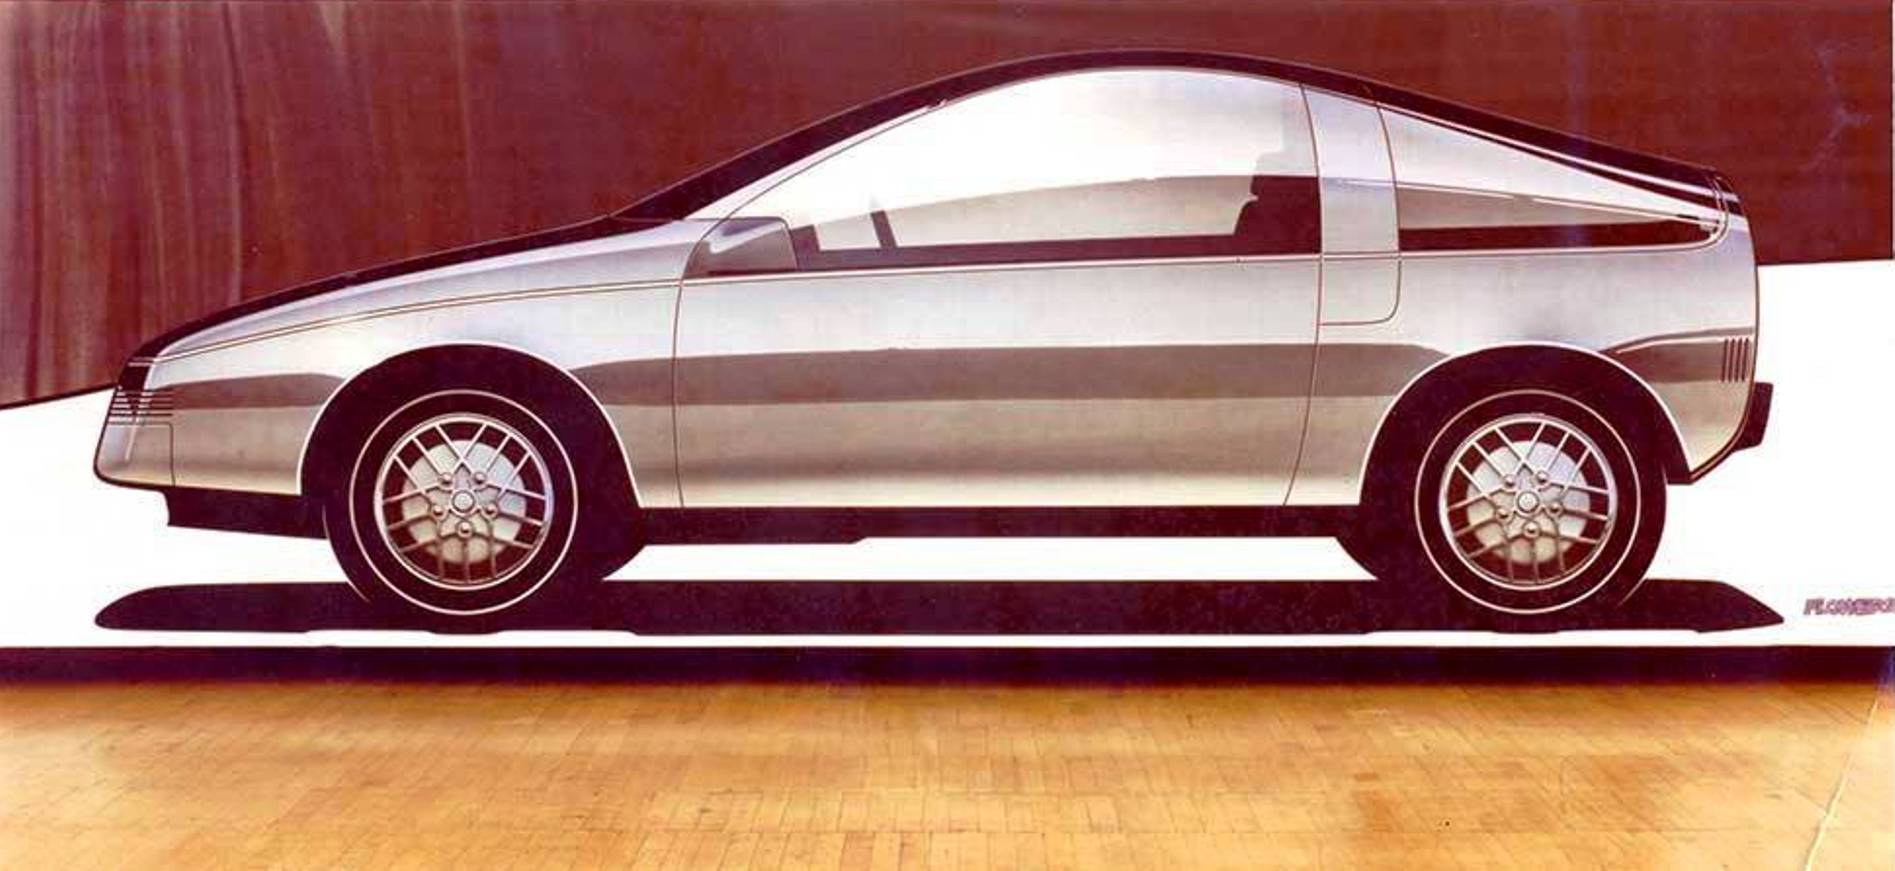 General motors electric car design study 1983 for General motors electric car